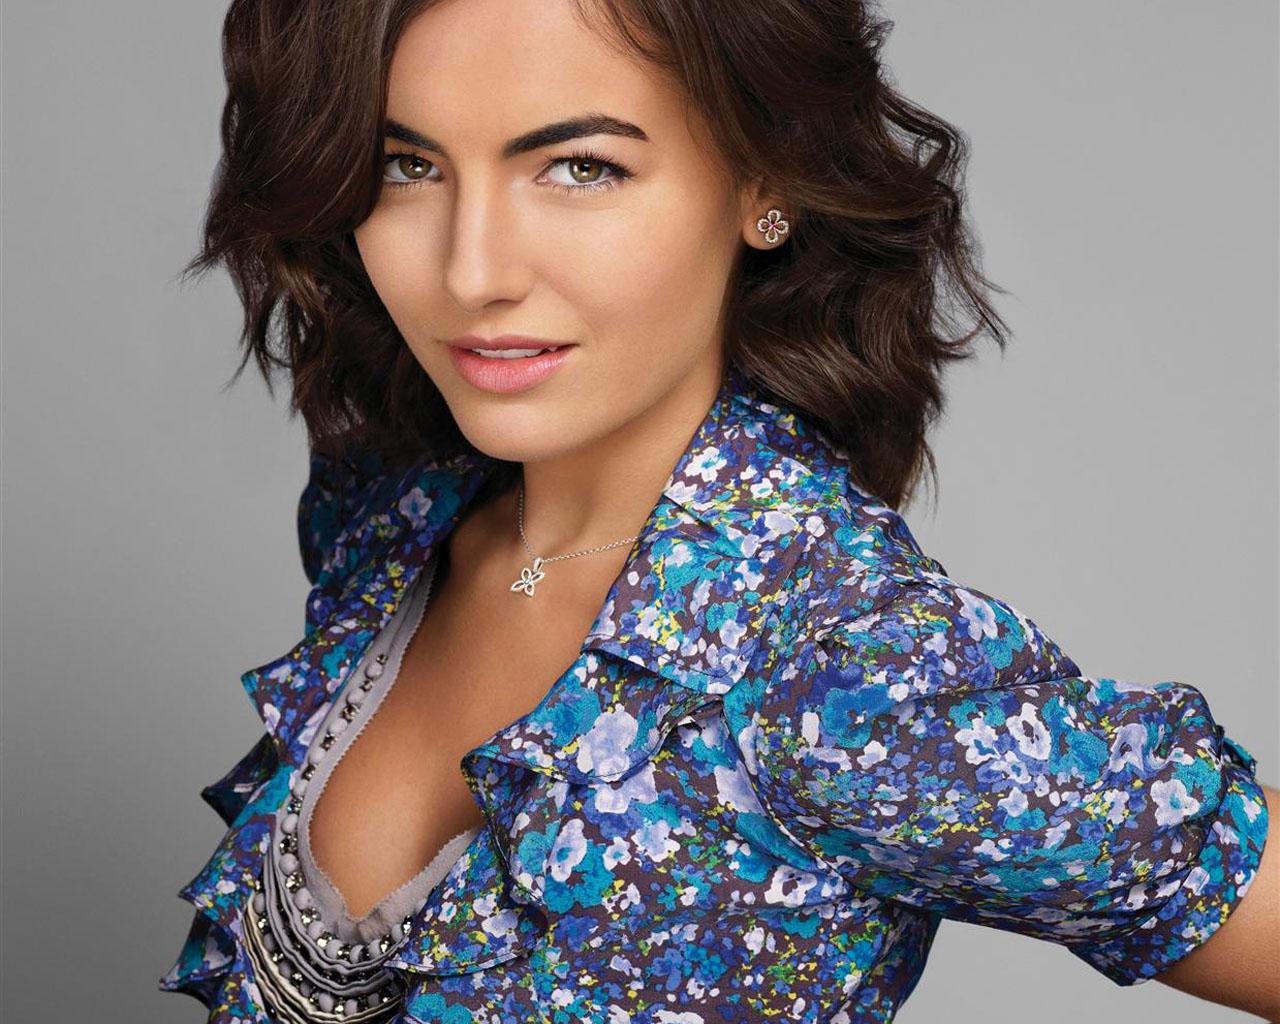 Camilla Belle